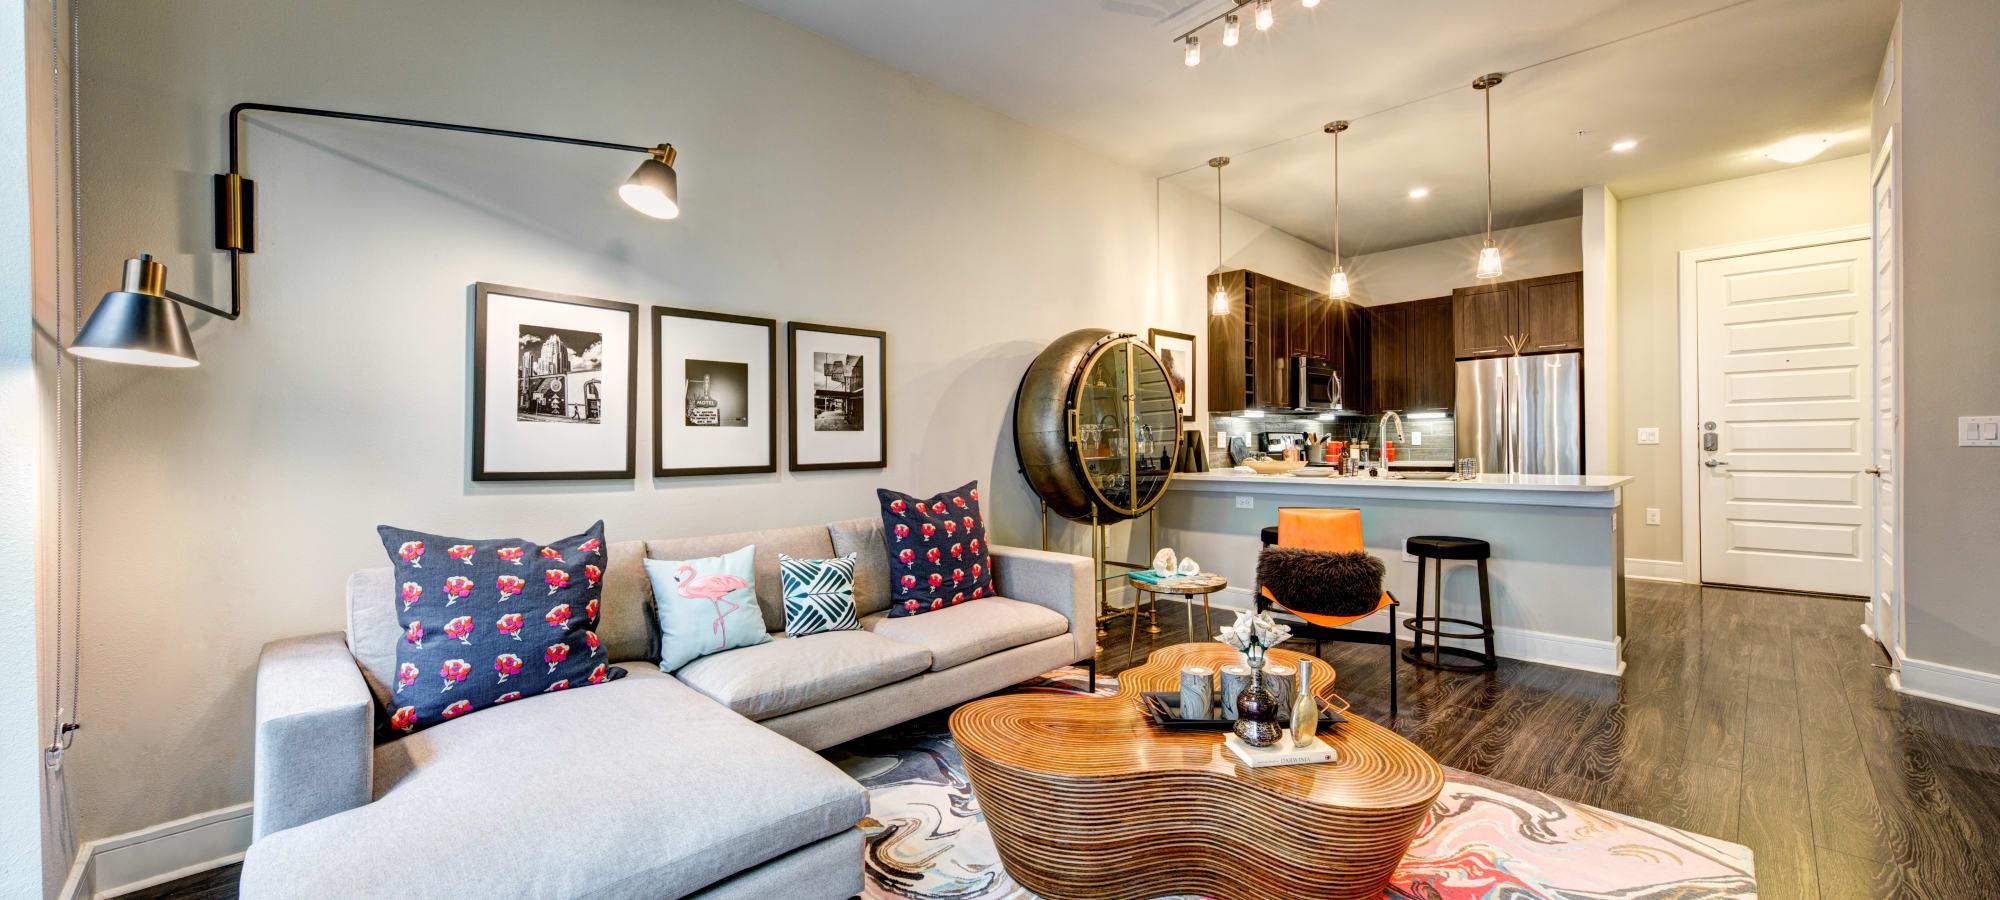 CWS Apartment Homes in Austin, Texas